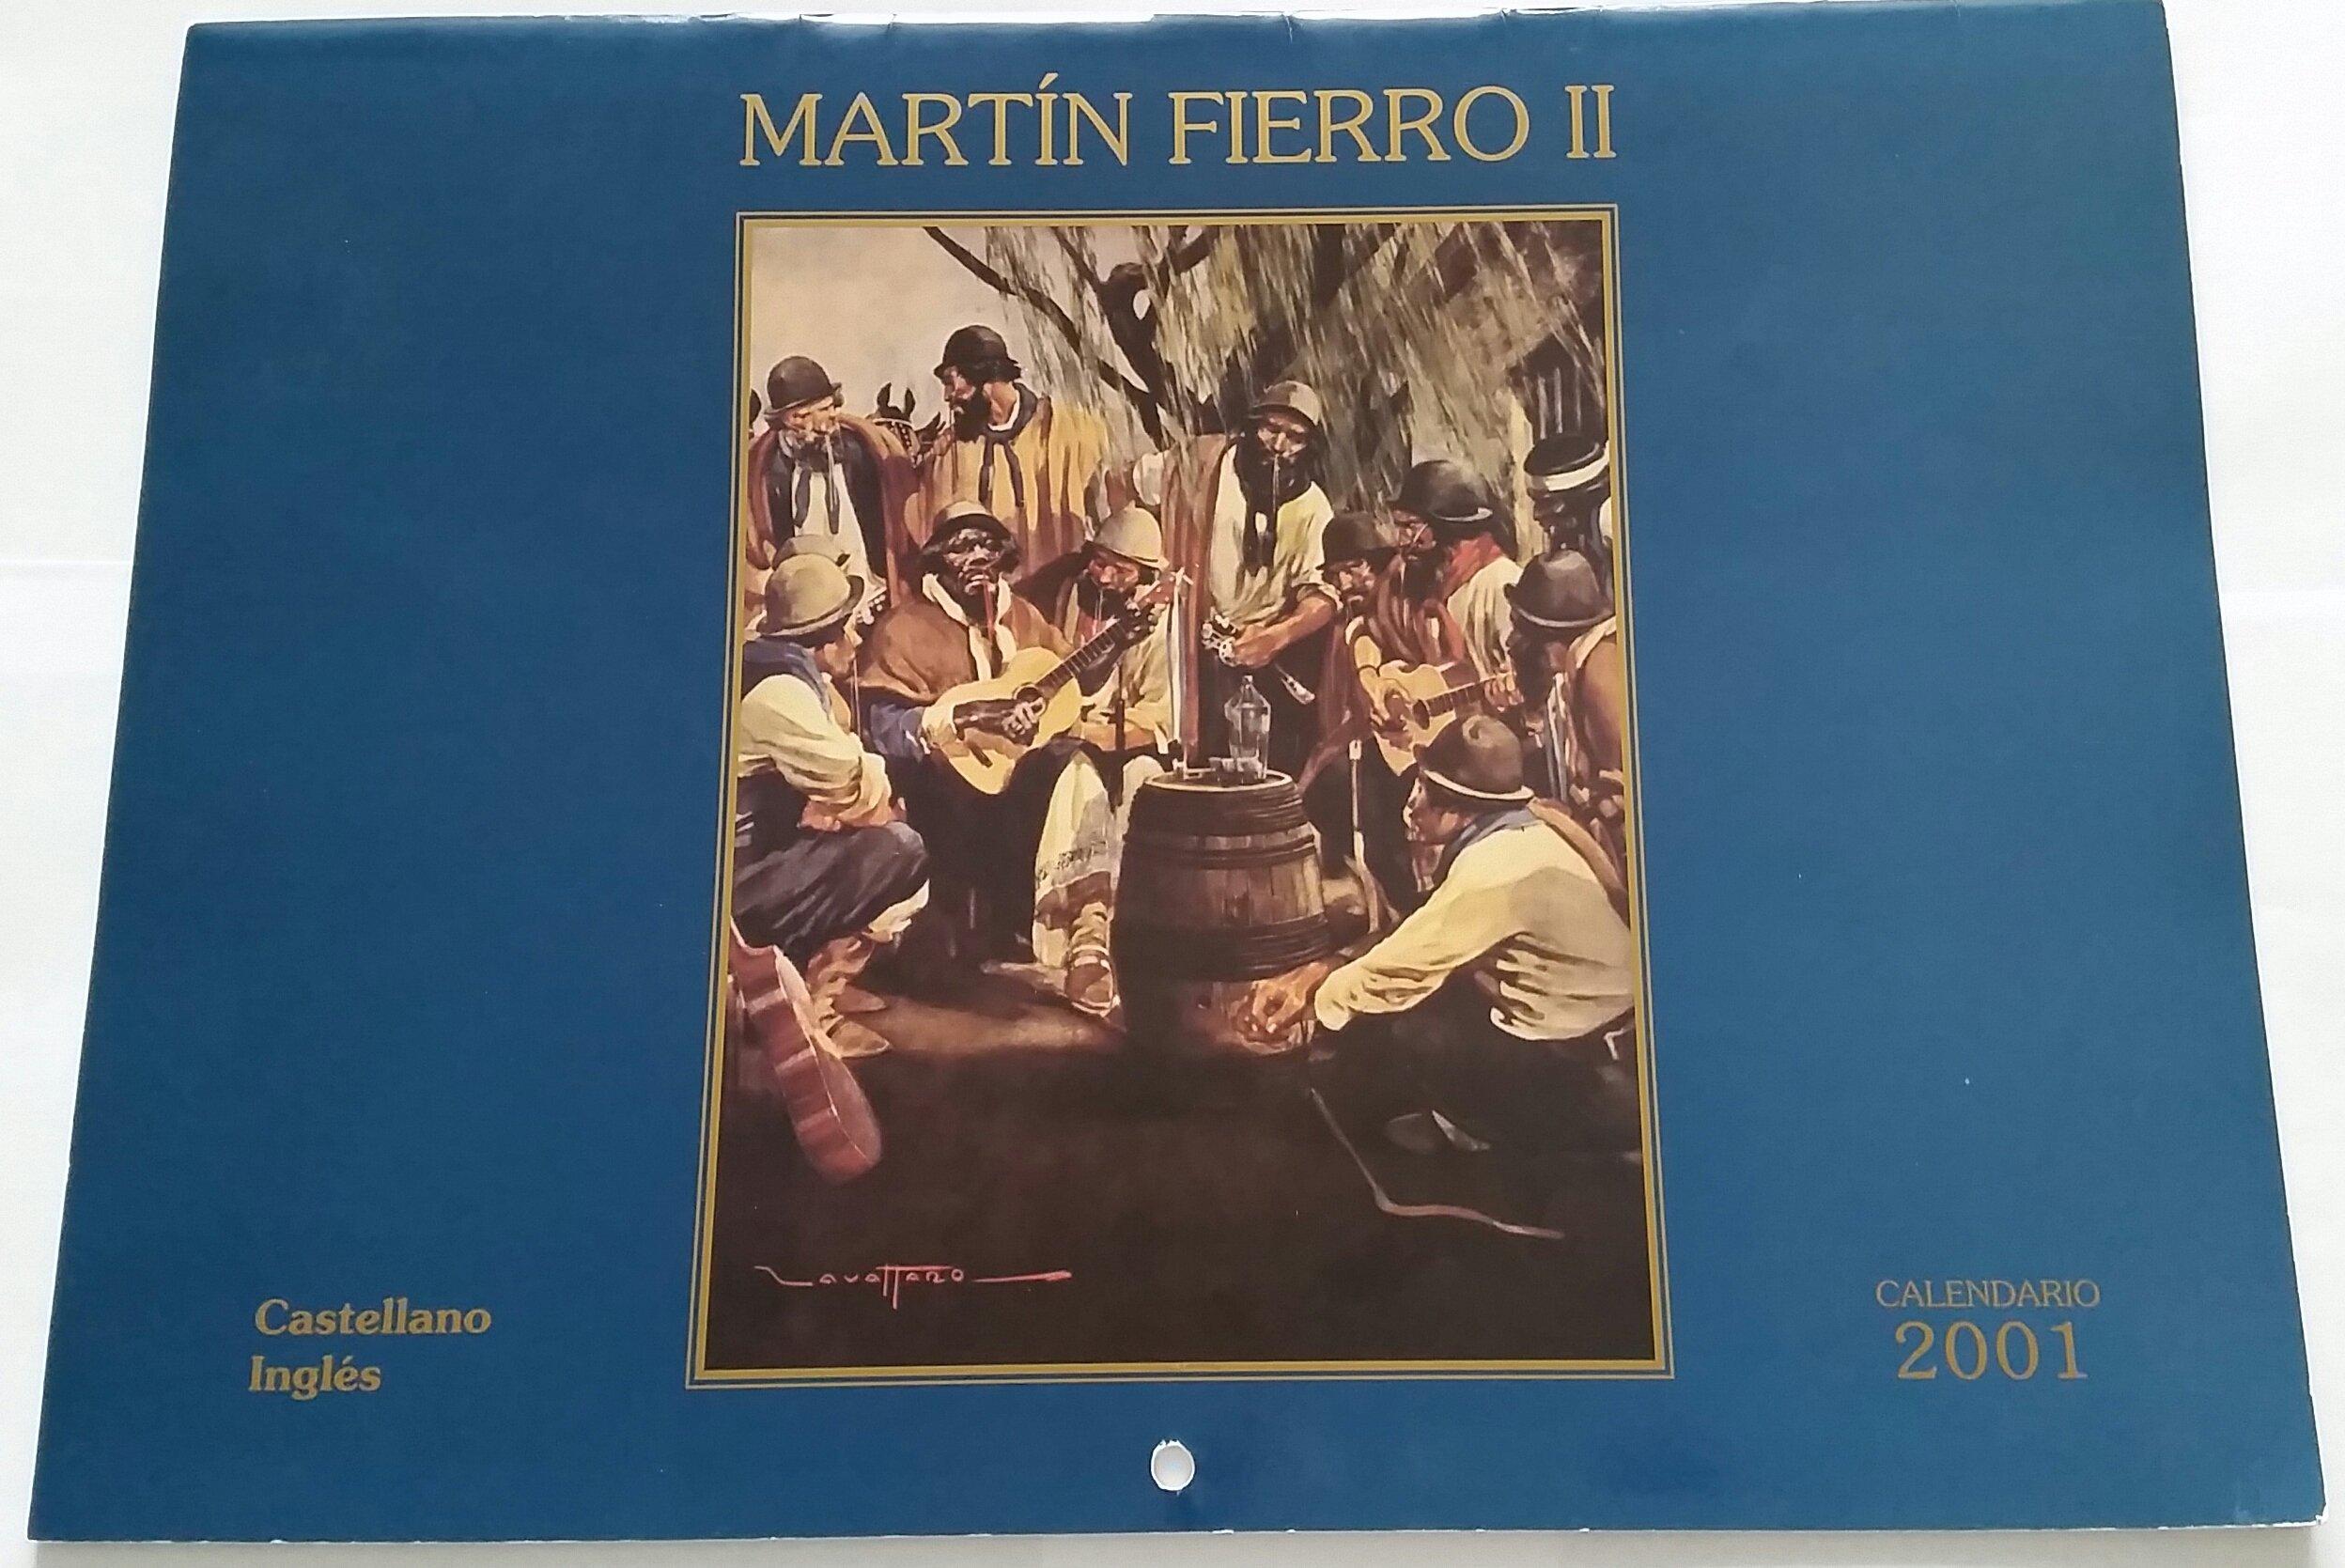 Calendario 2001.Martin Fierro Ii De Jose Hernandez Calendario 2001 Jose Hernandez